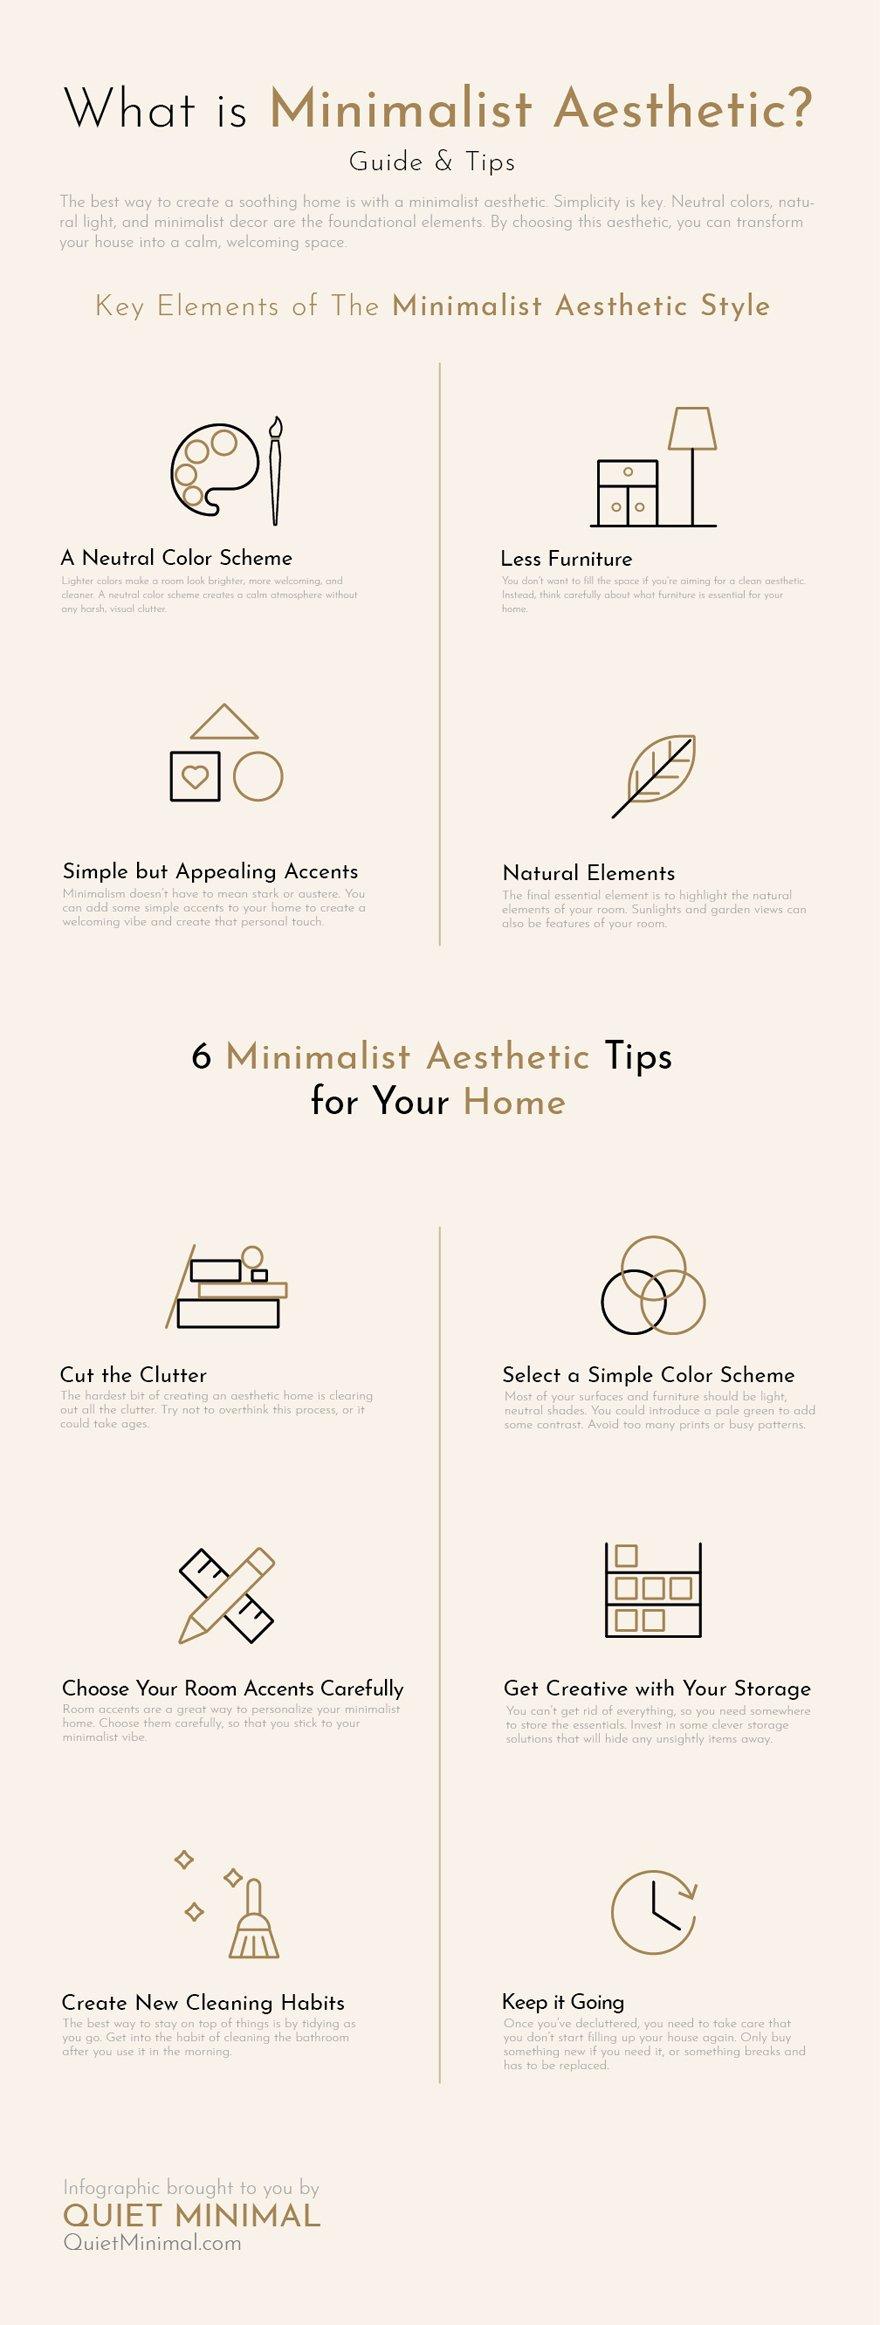 What is minimalist aesthetic